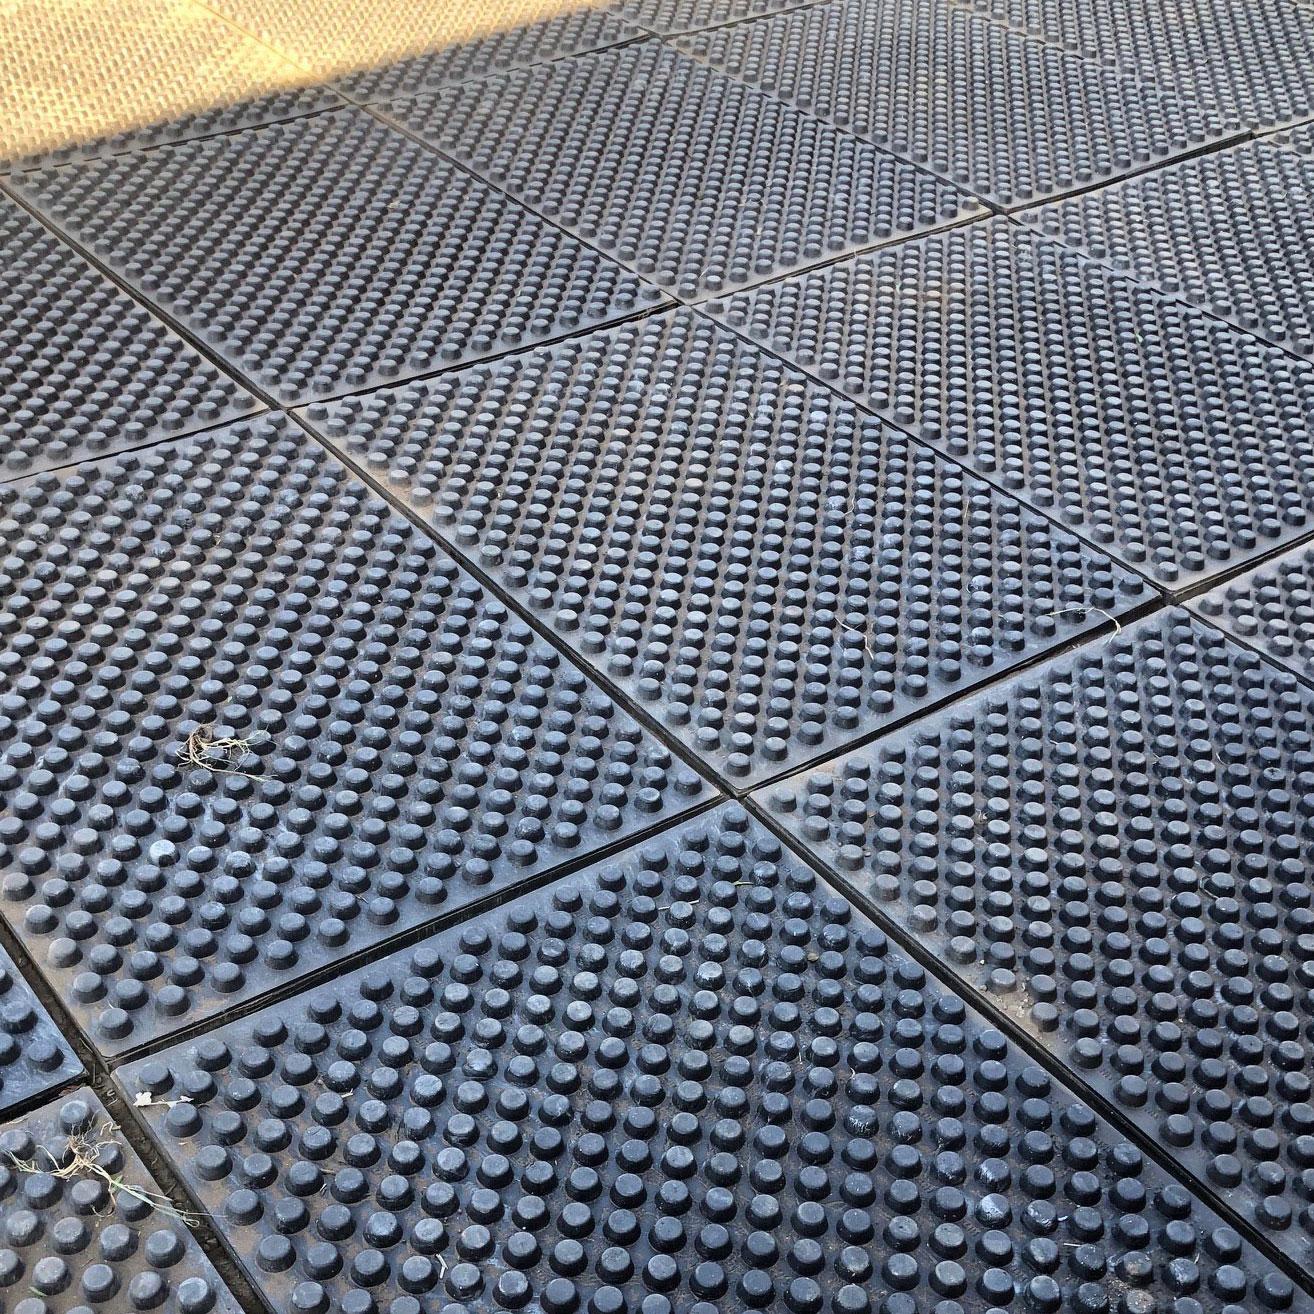 Paddock mats with sand